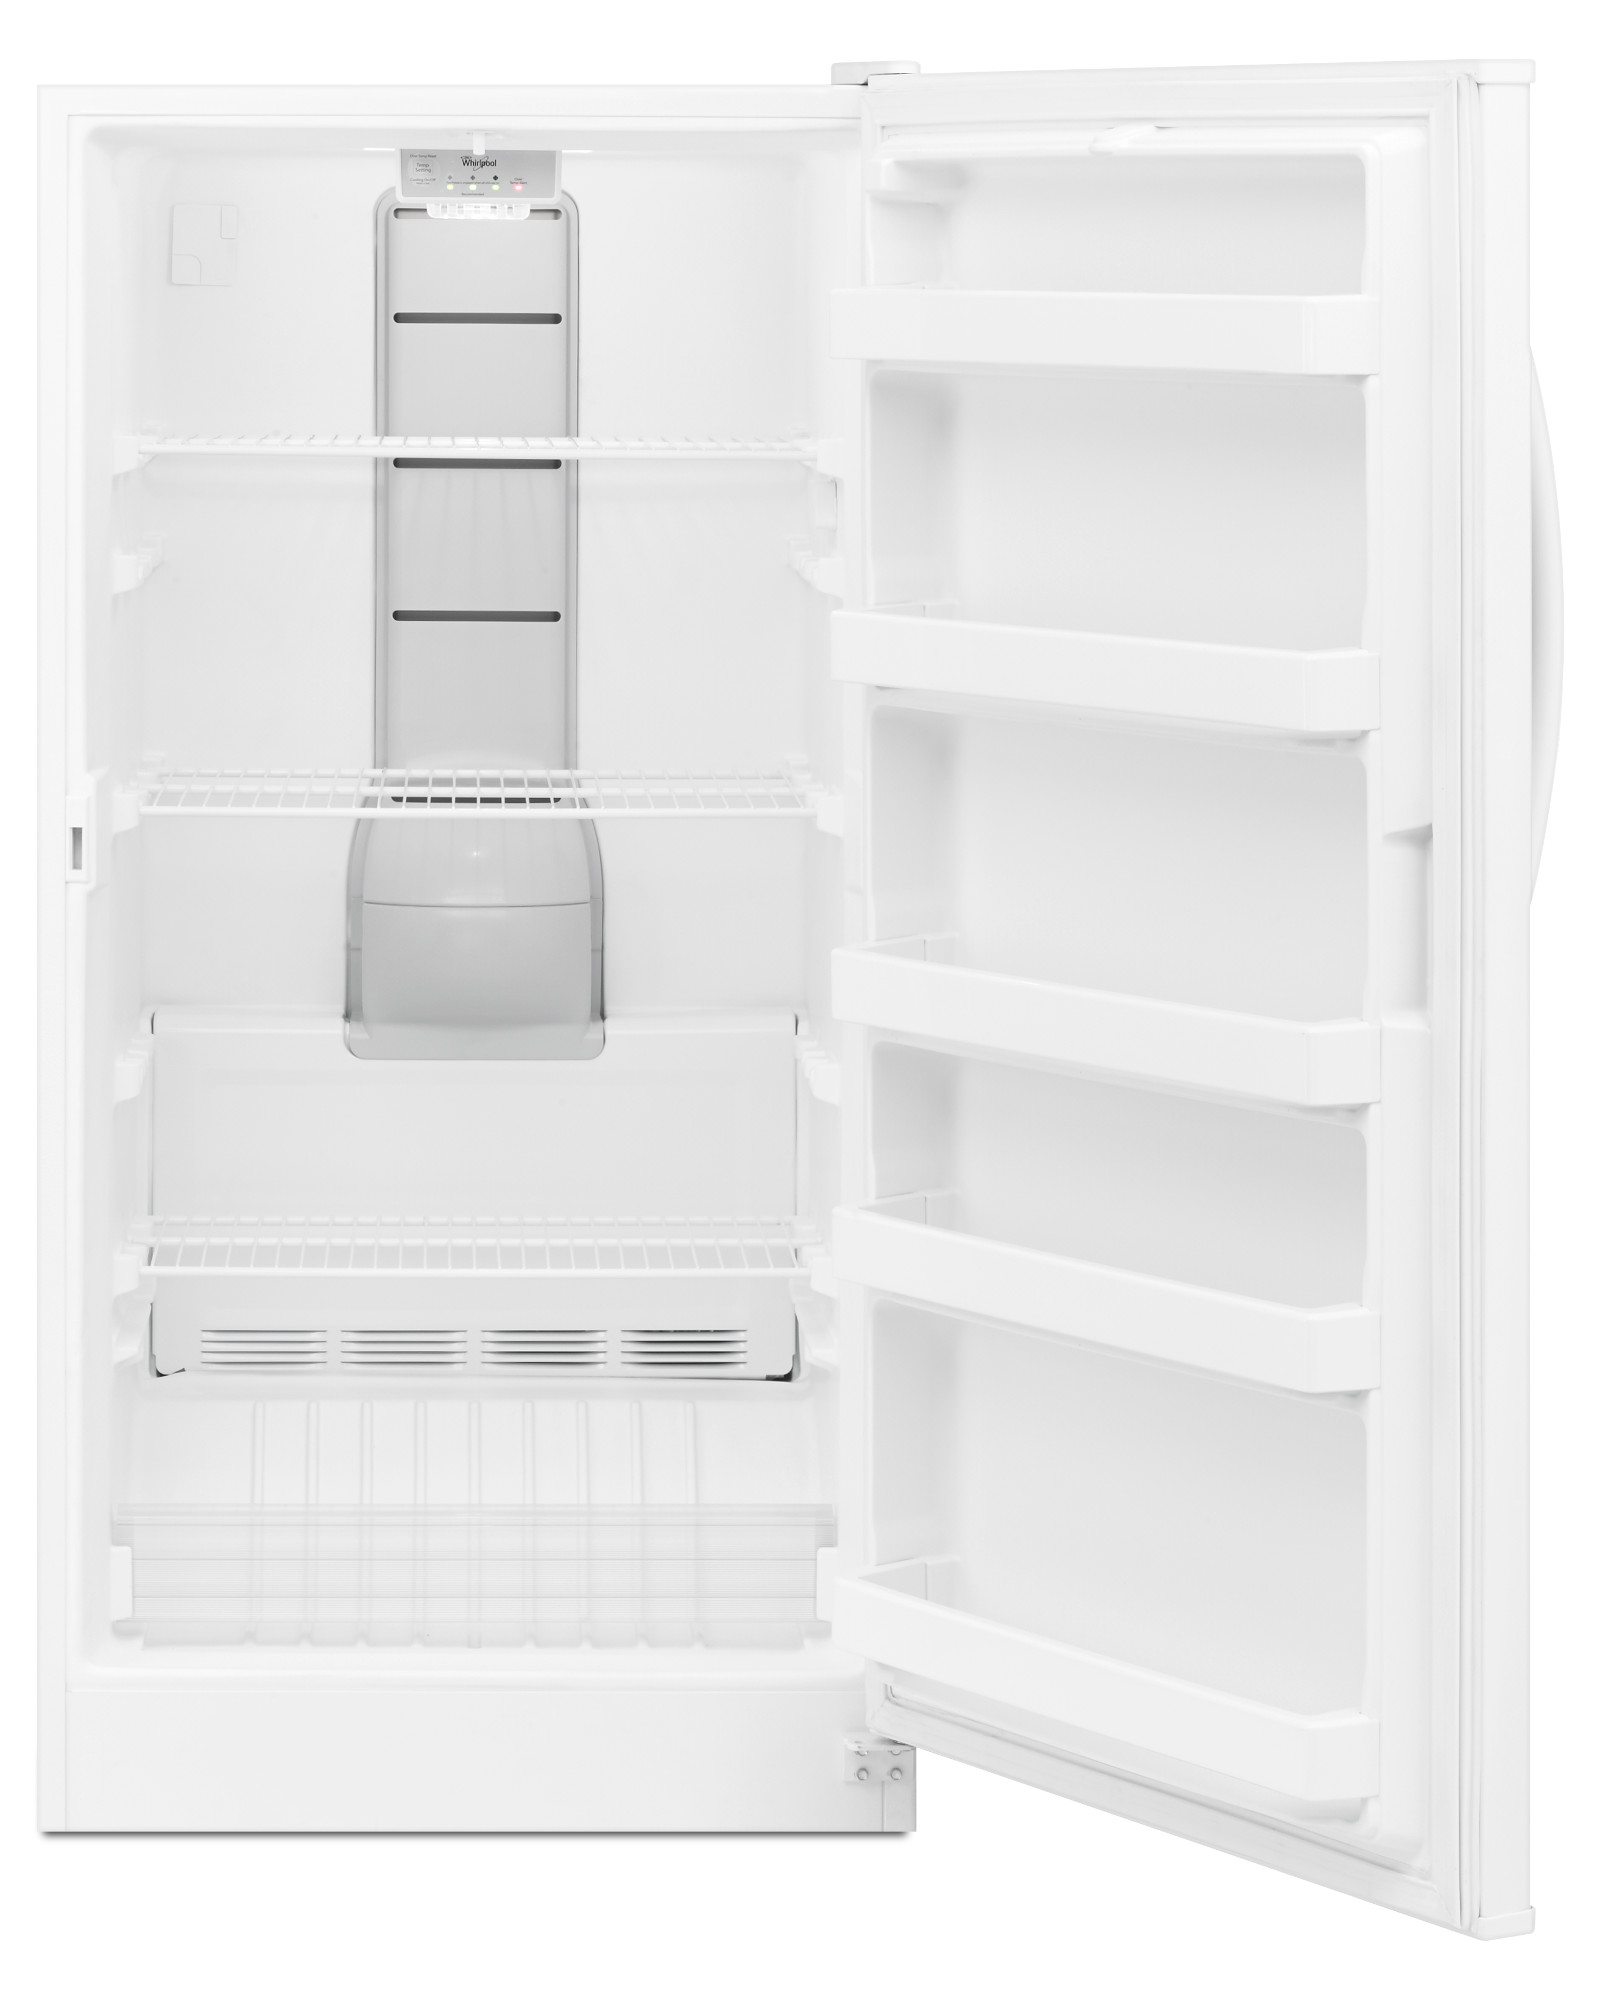 Whirlpool WZF56R16DW 16 cu. ft. Upright Freezer w/ LED Interior Lighting - White